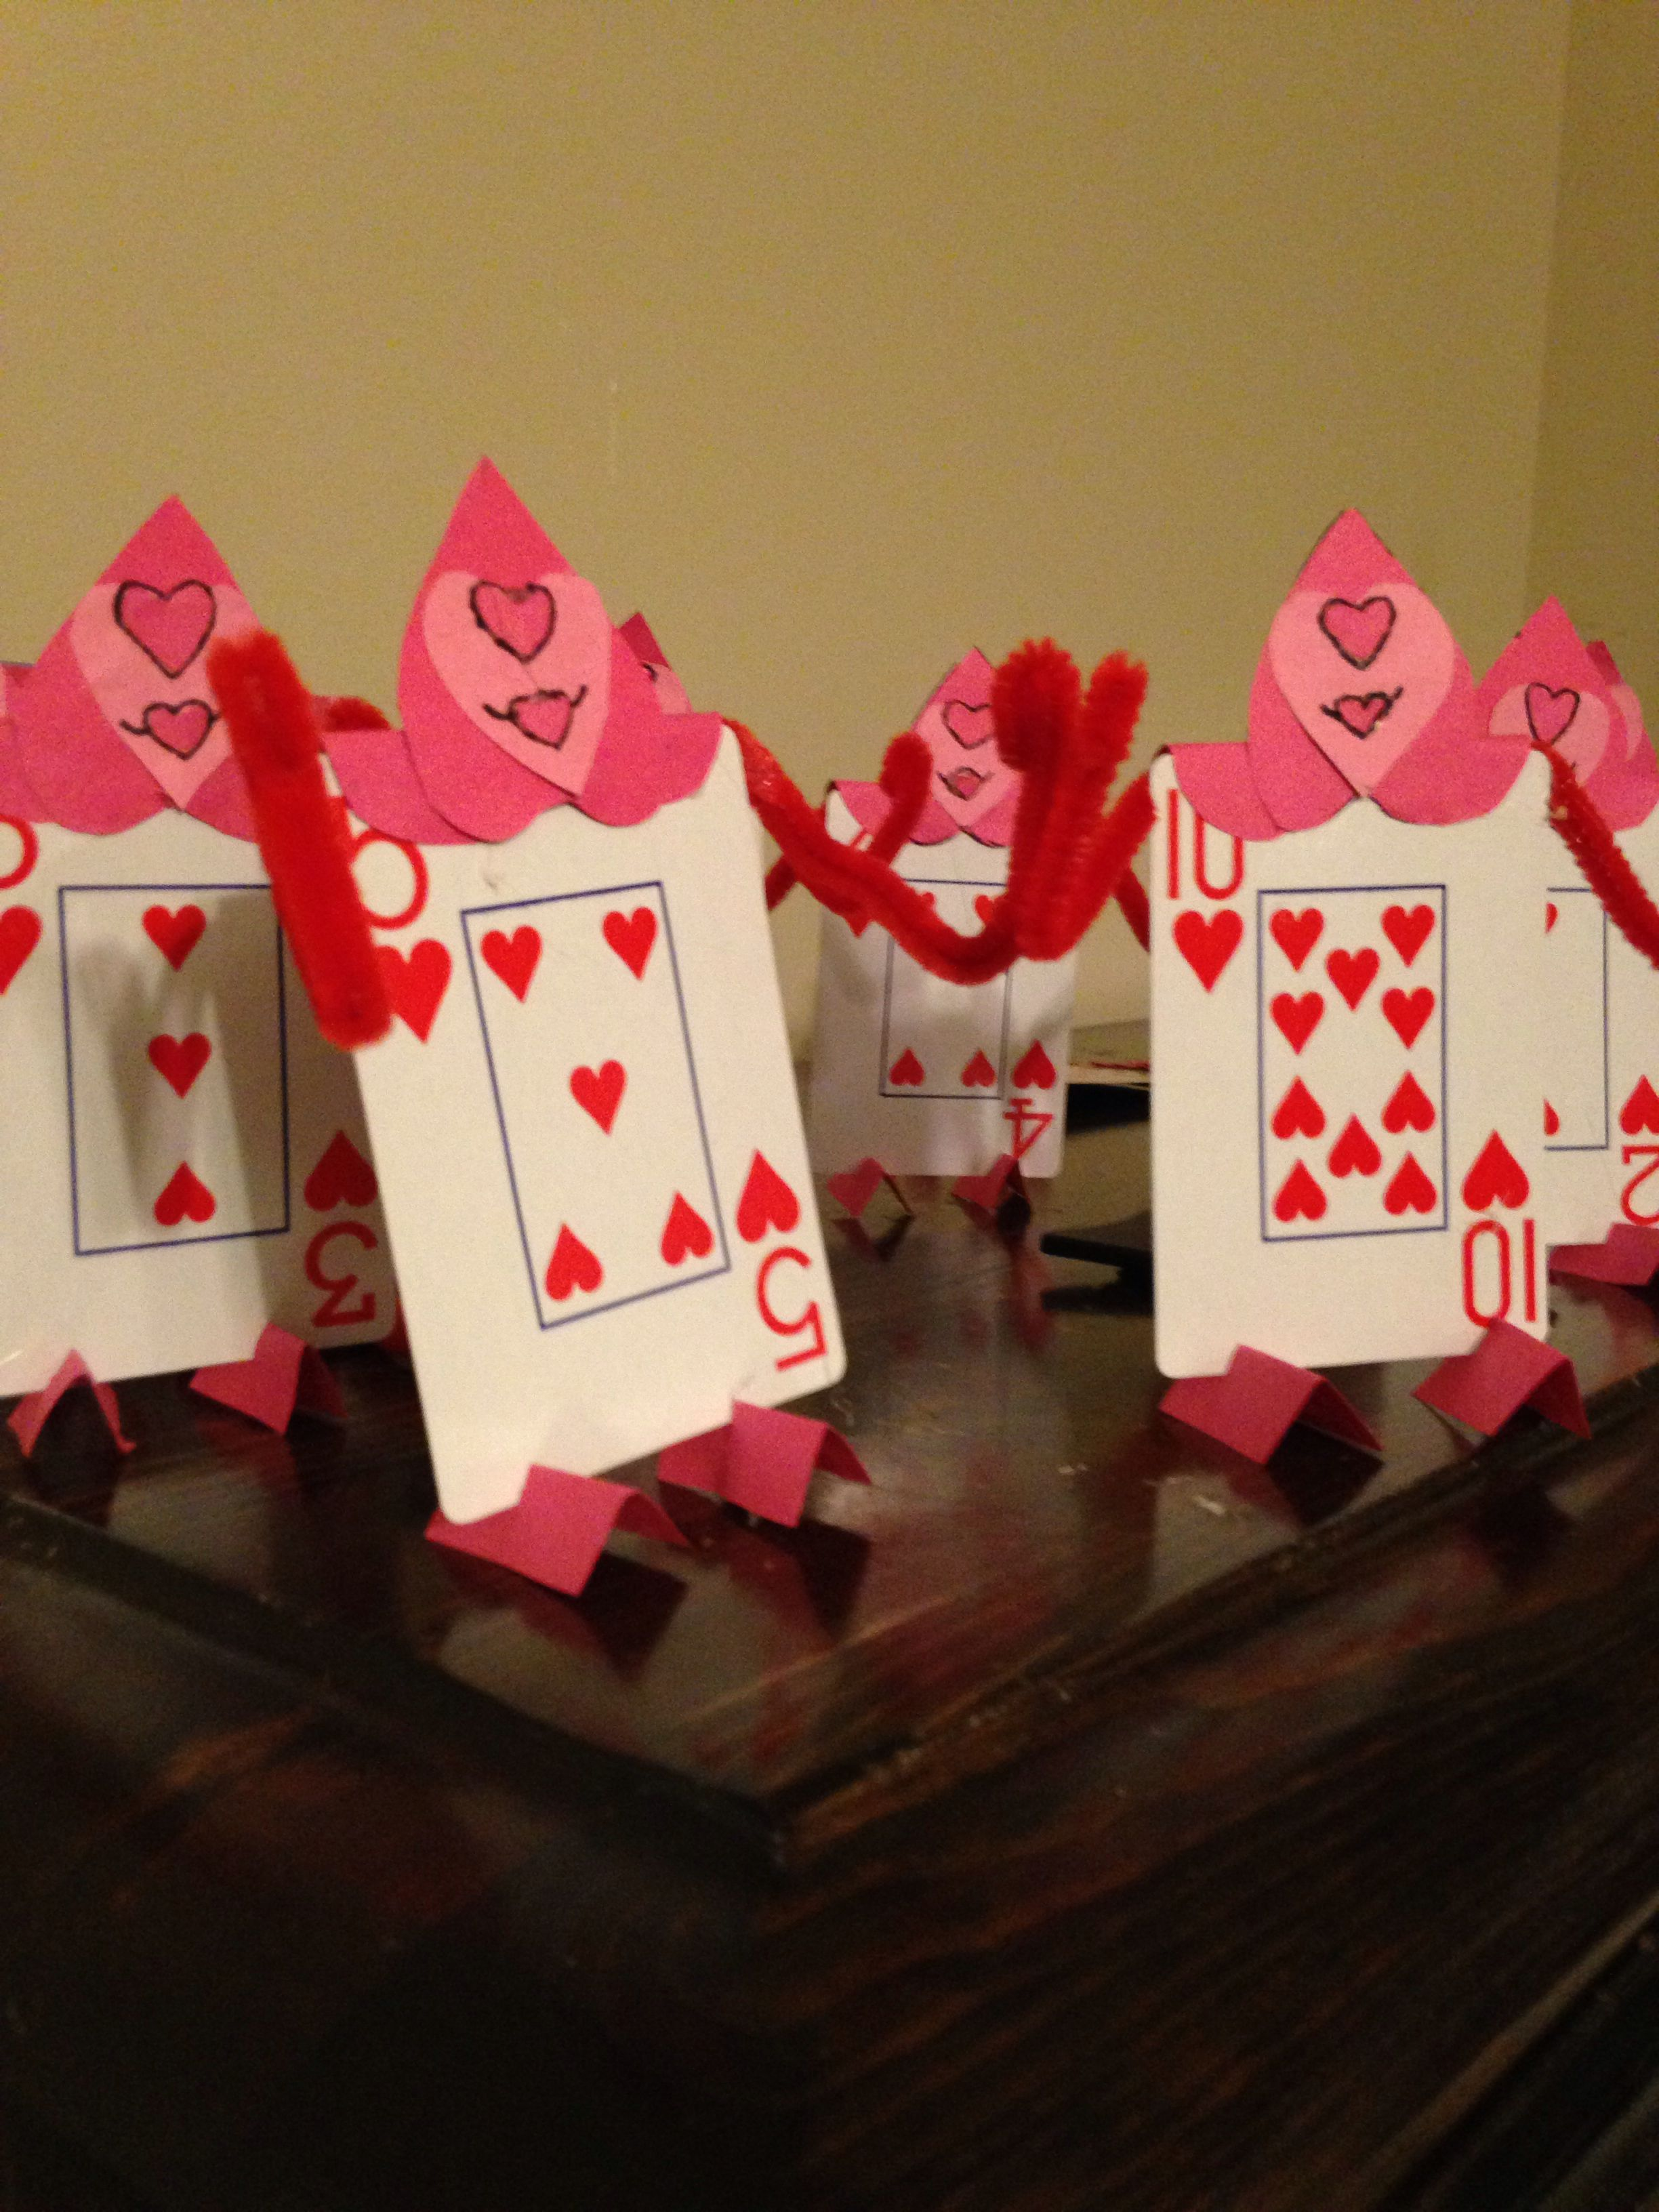 Wonderland Heart Guards